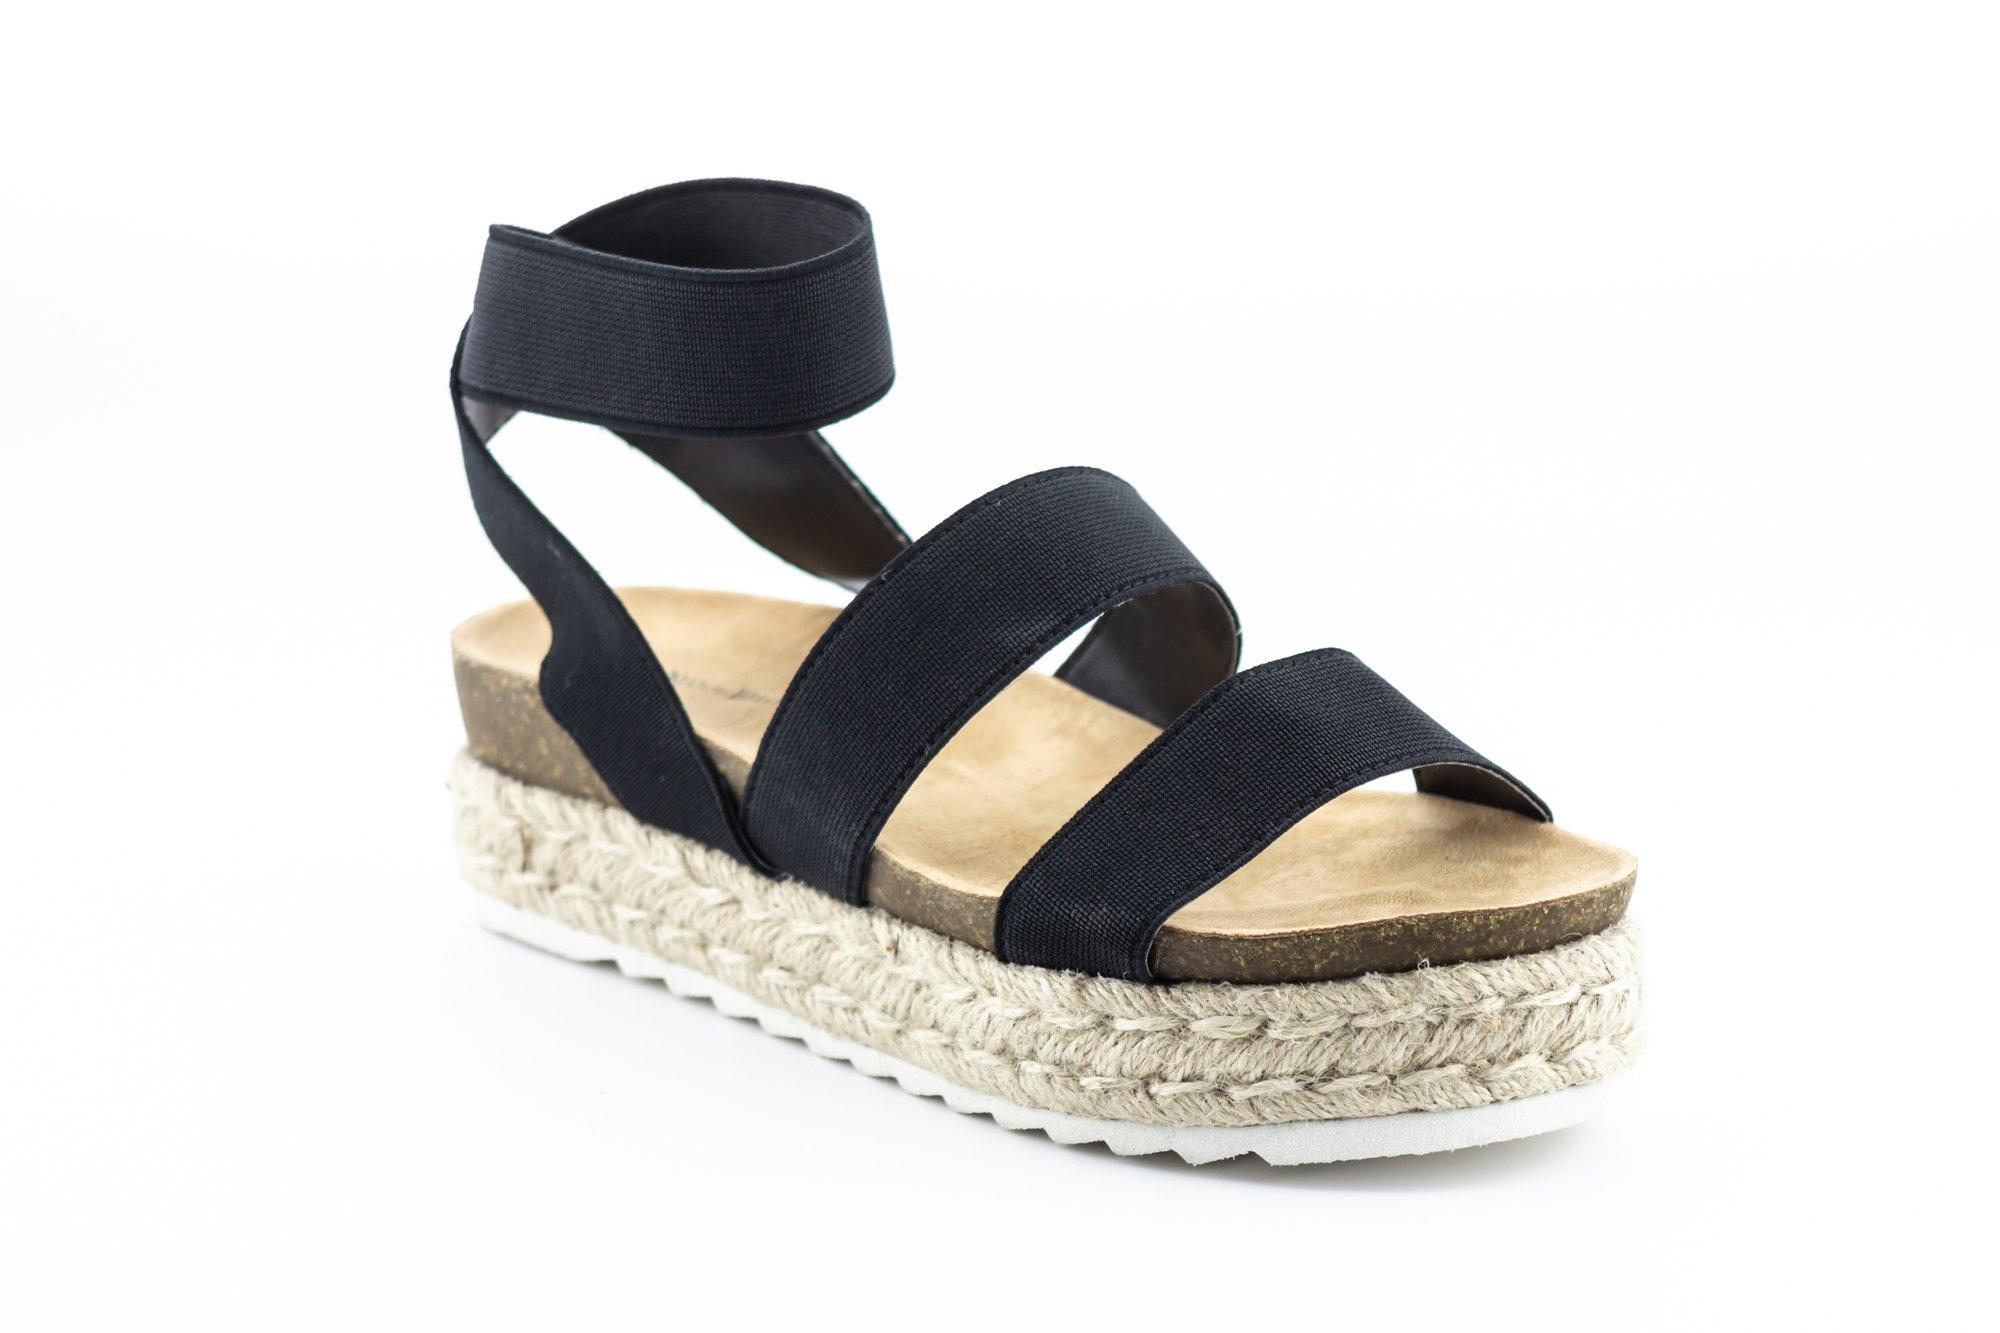 CALICO KIKI KACIE-CK02 Women's Ankle Strap Platform Sandals Fashion Open Toe Stretchy (8.5 US Black)